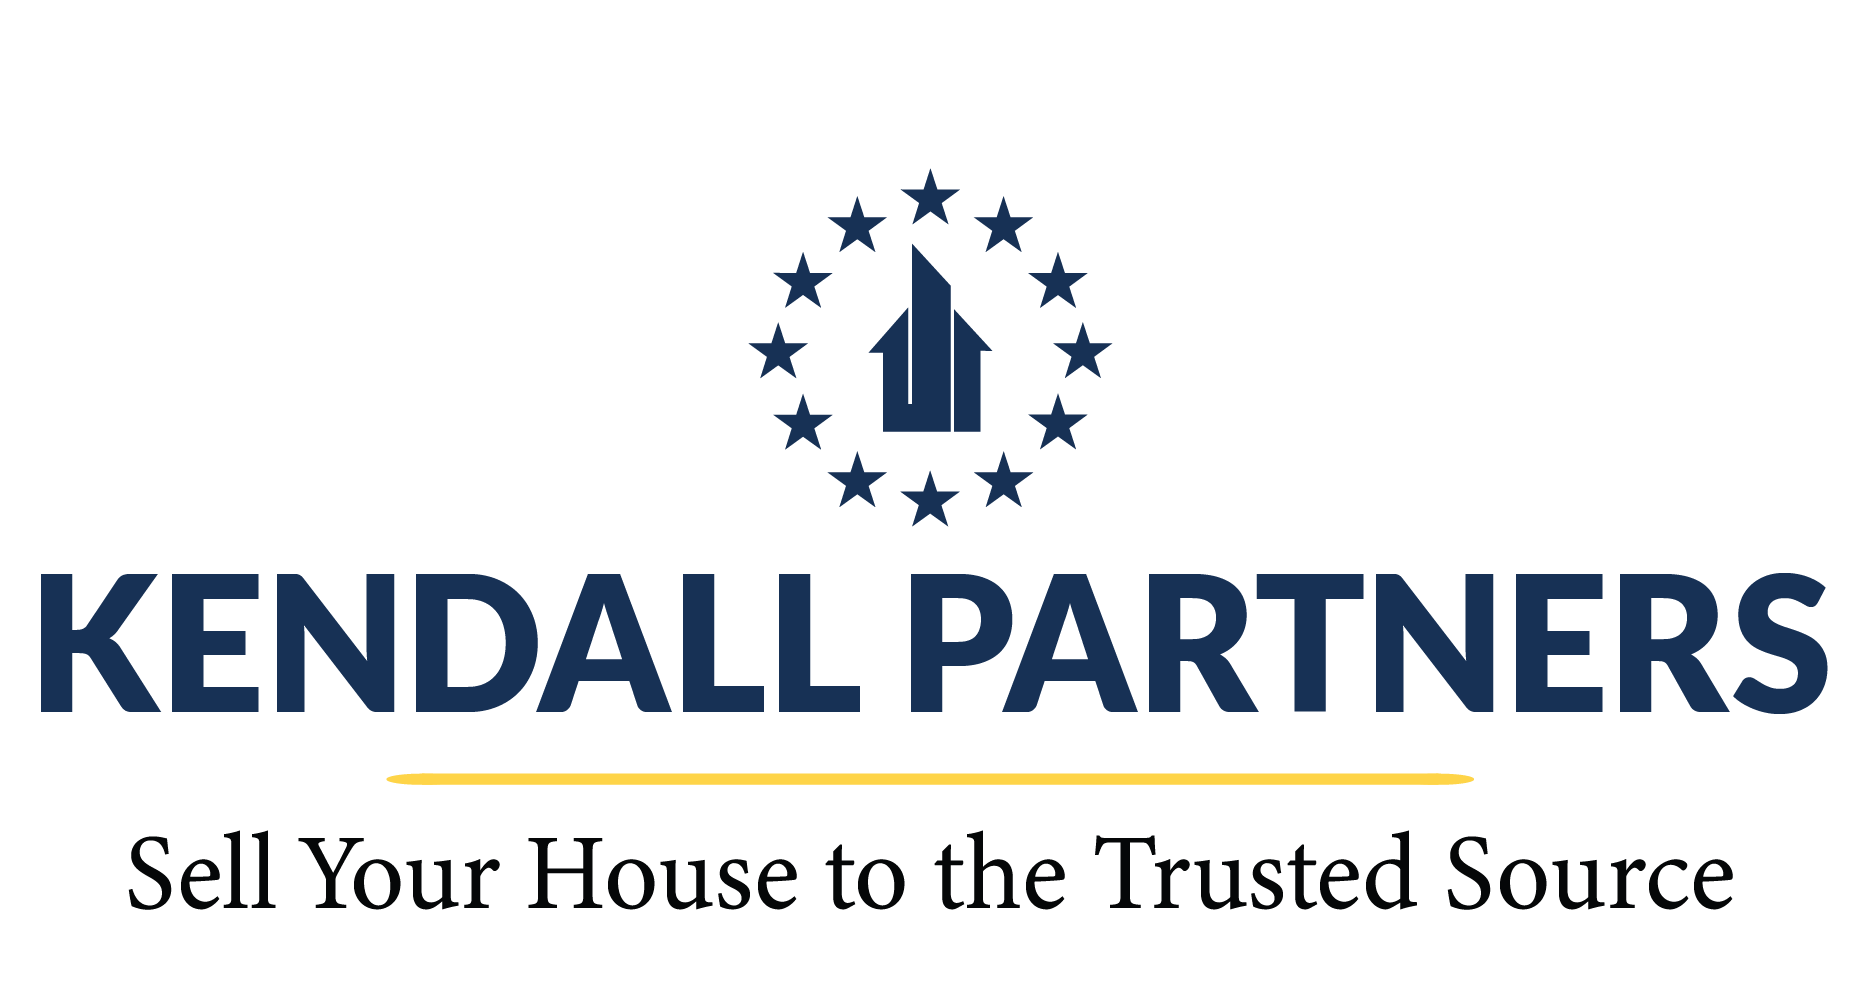 Kendall Partners logo